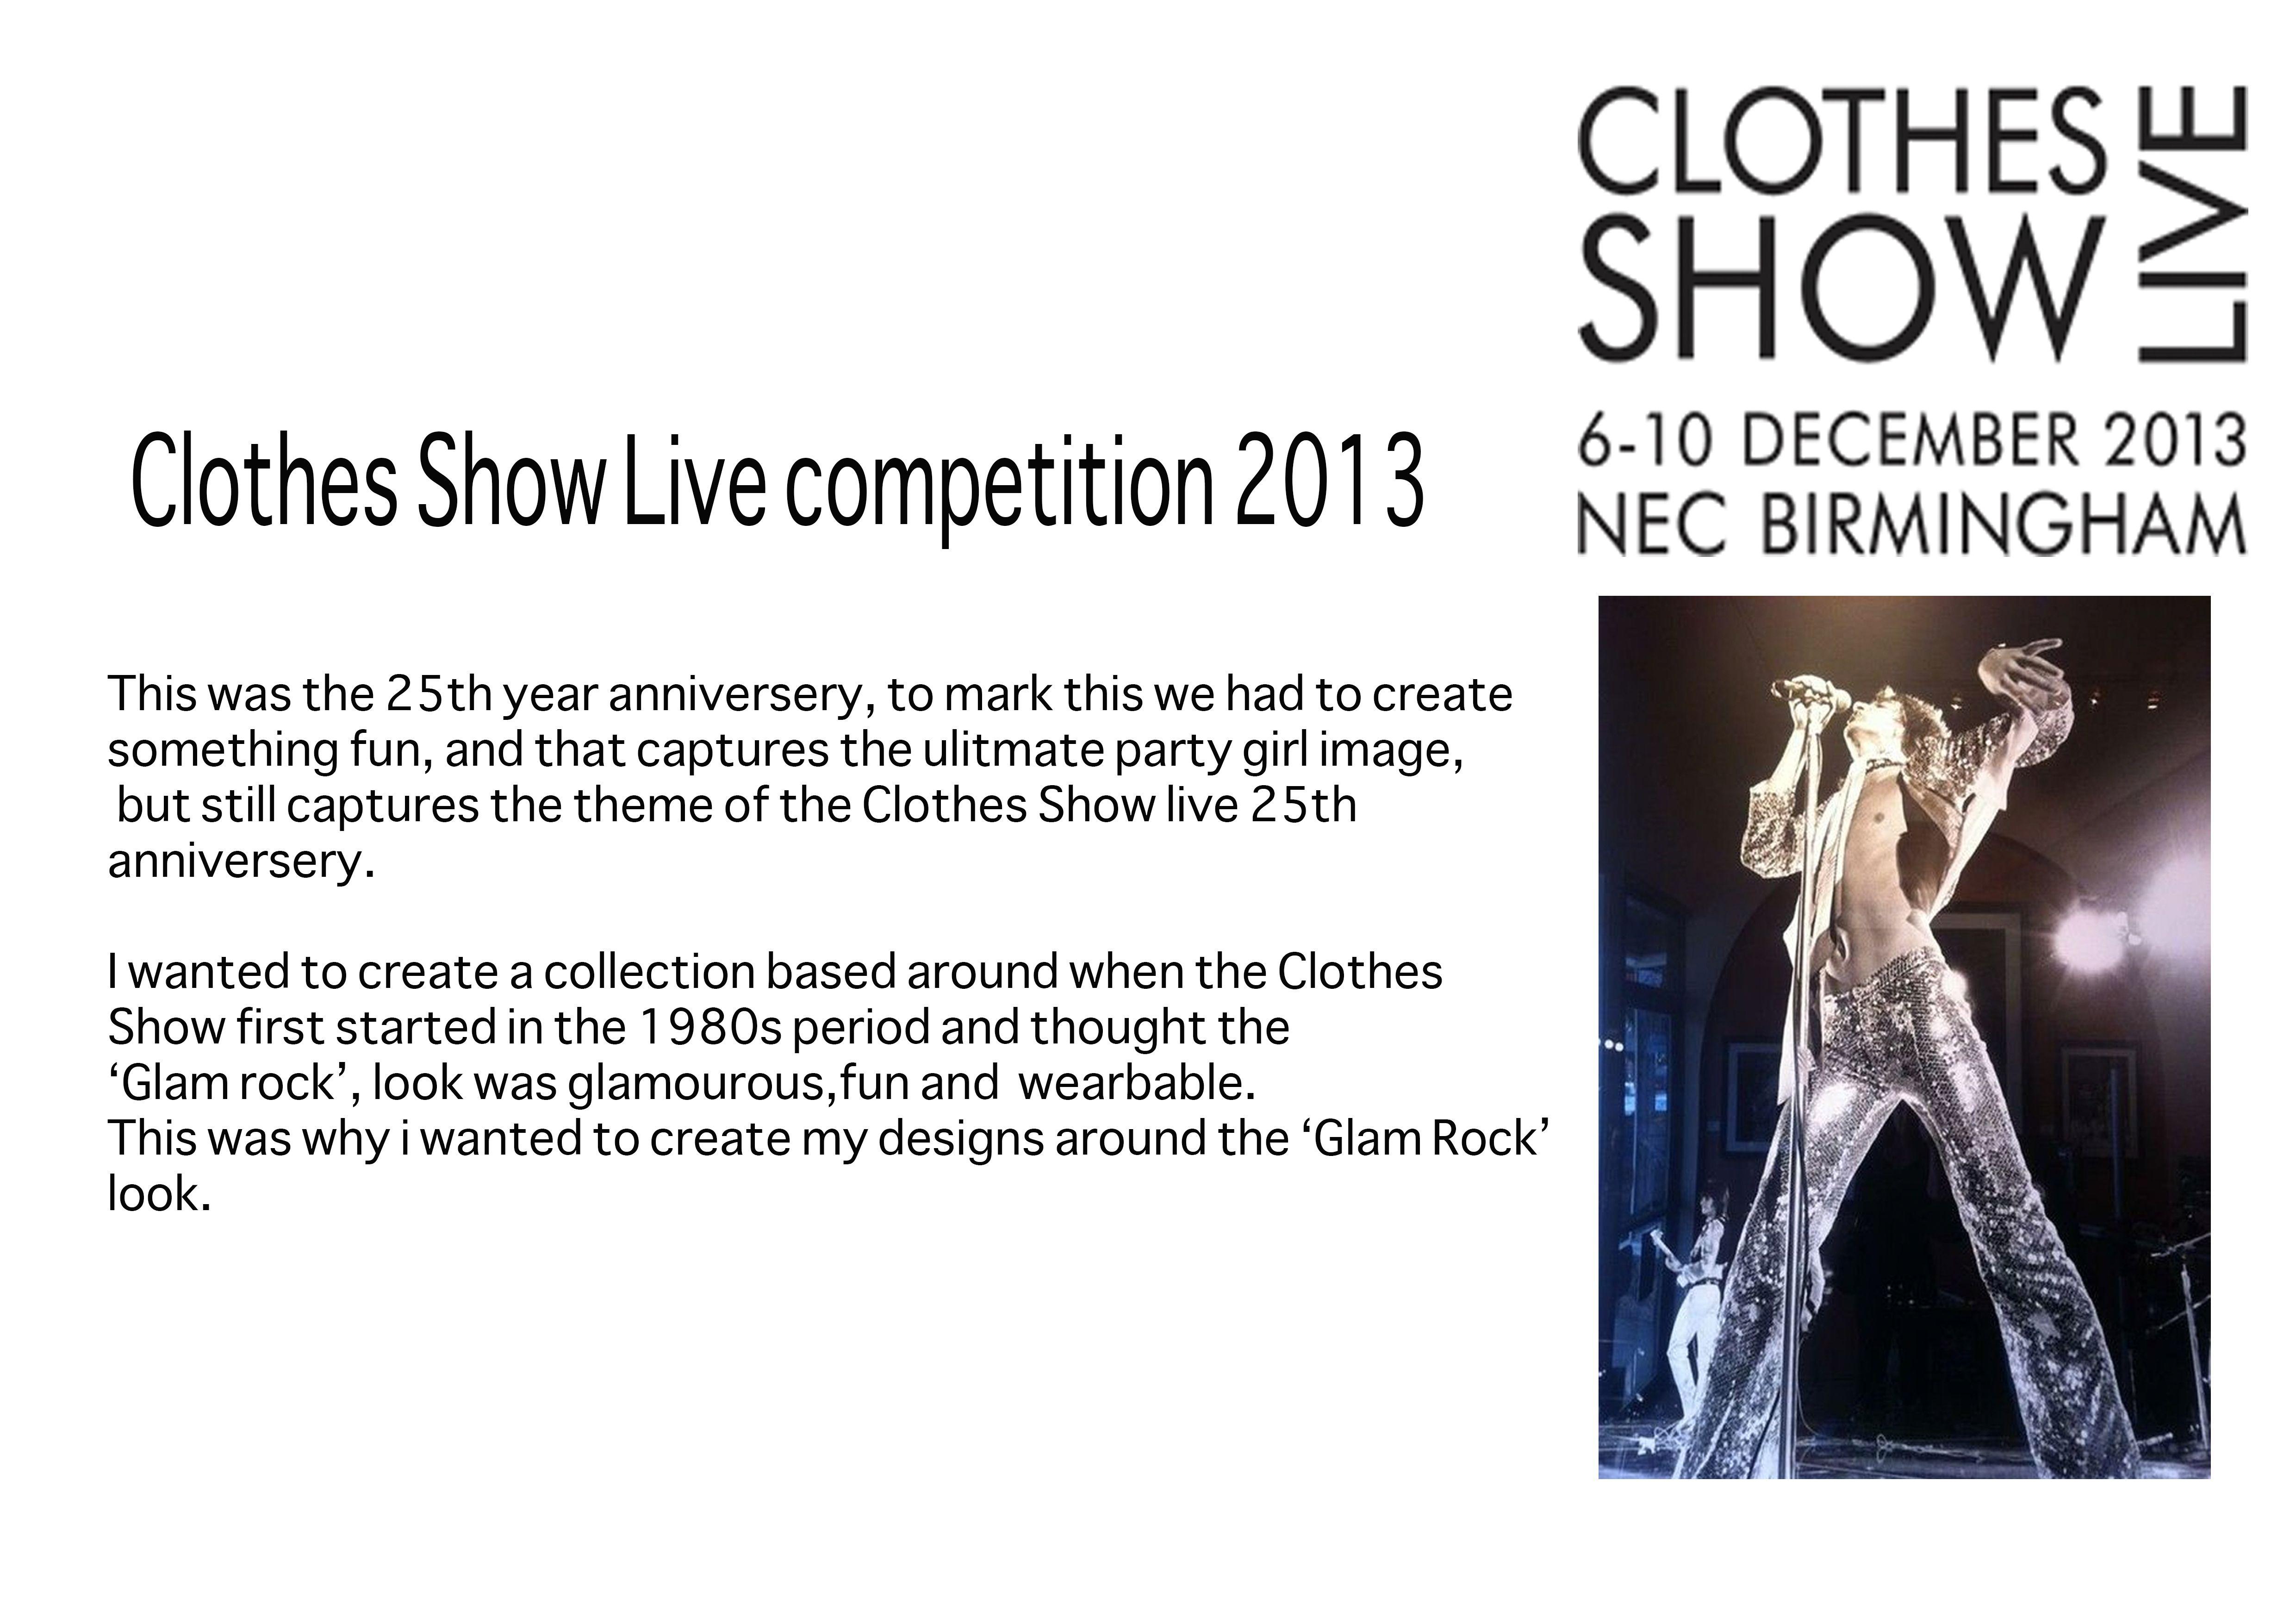 clothesshowlive